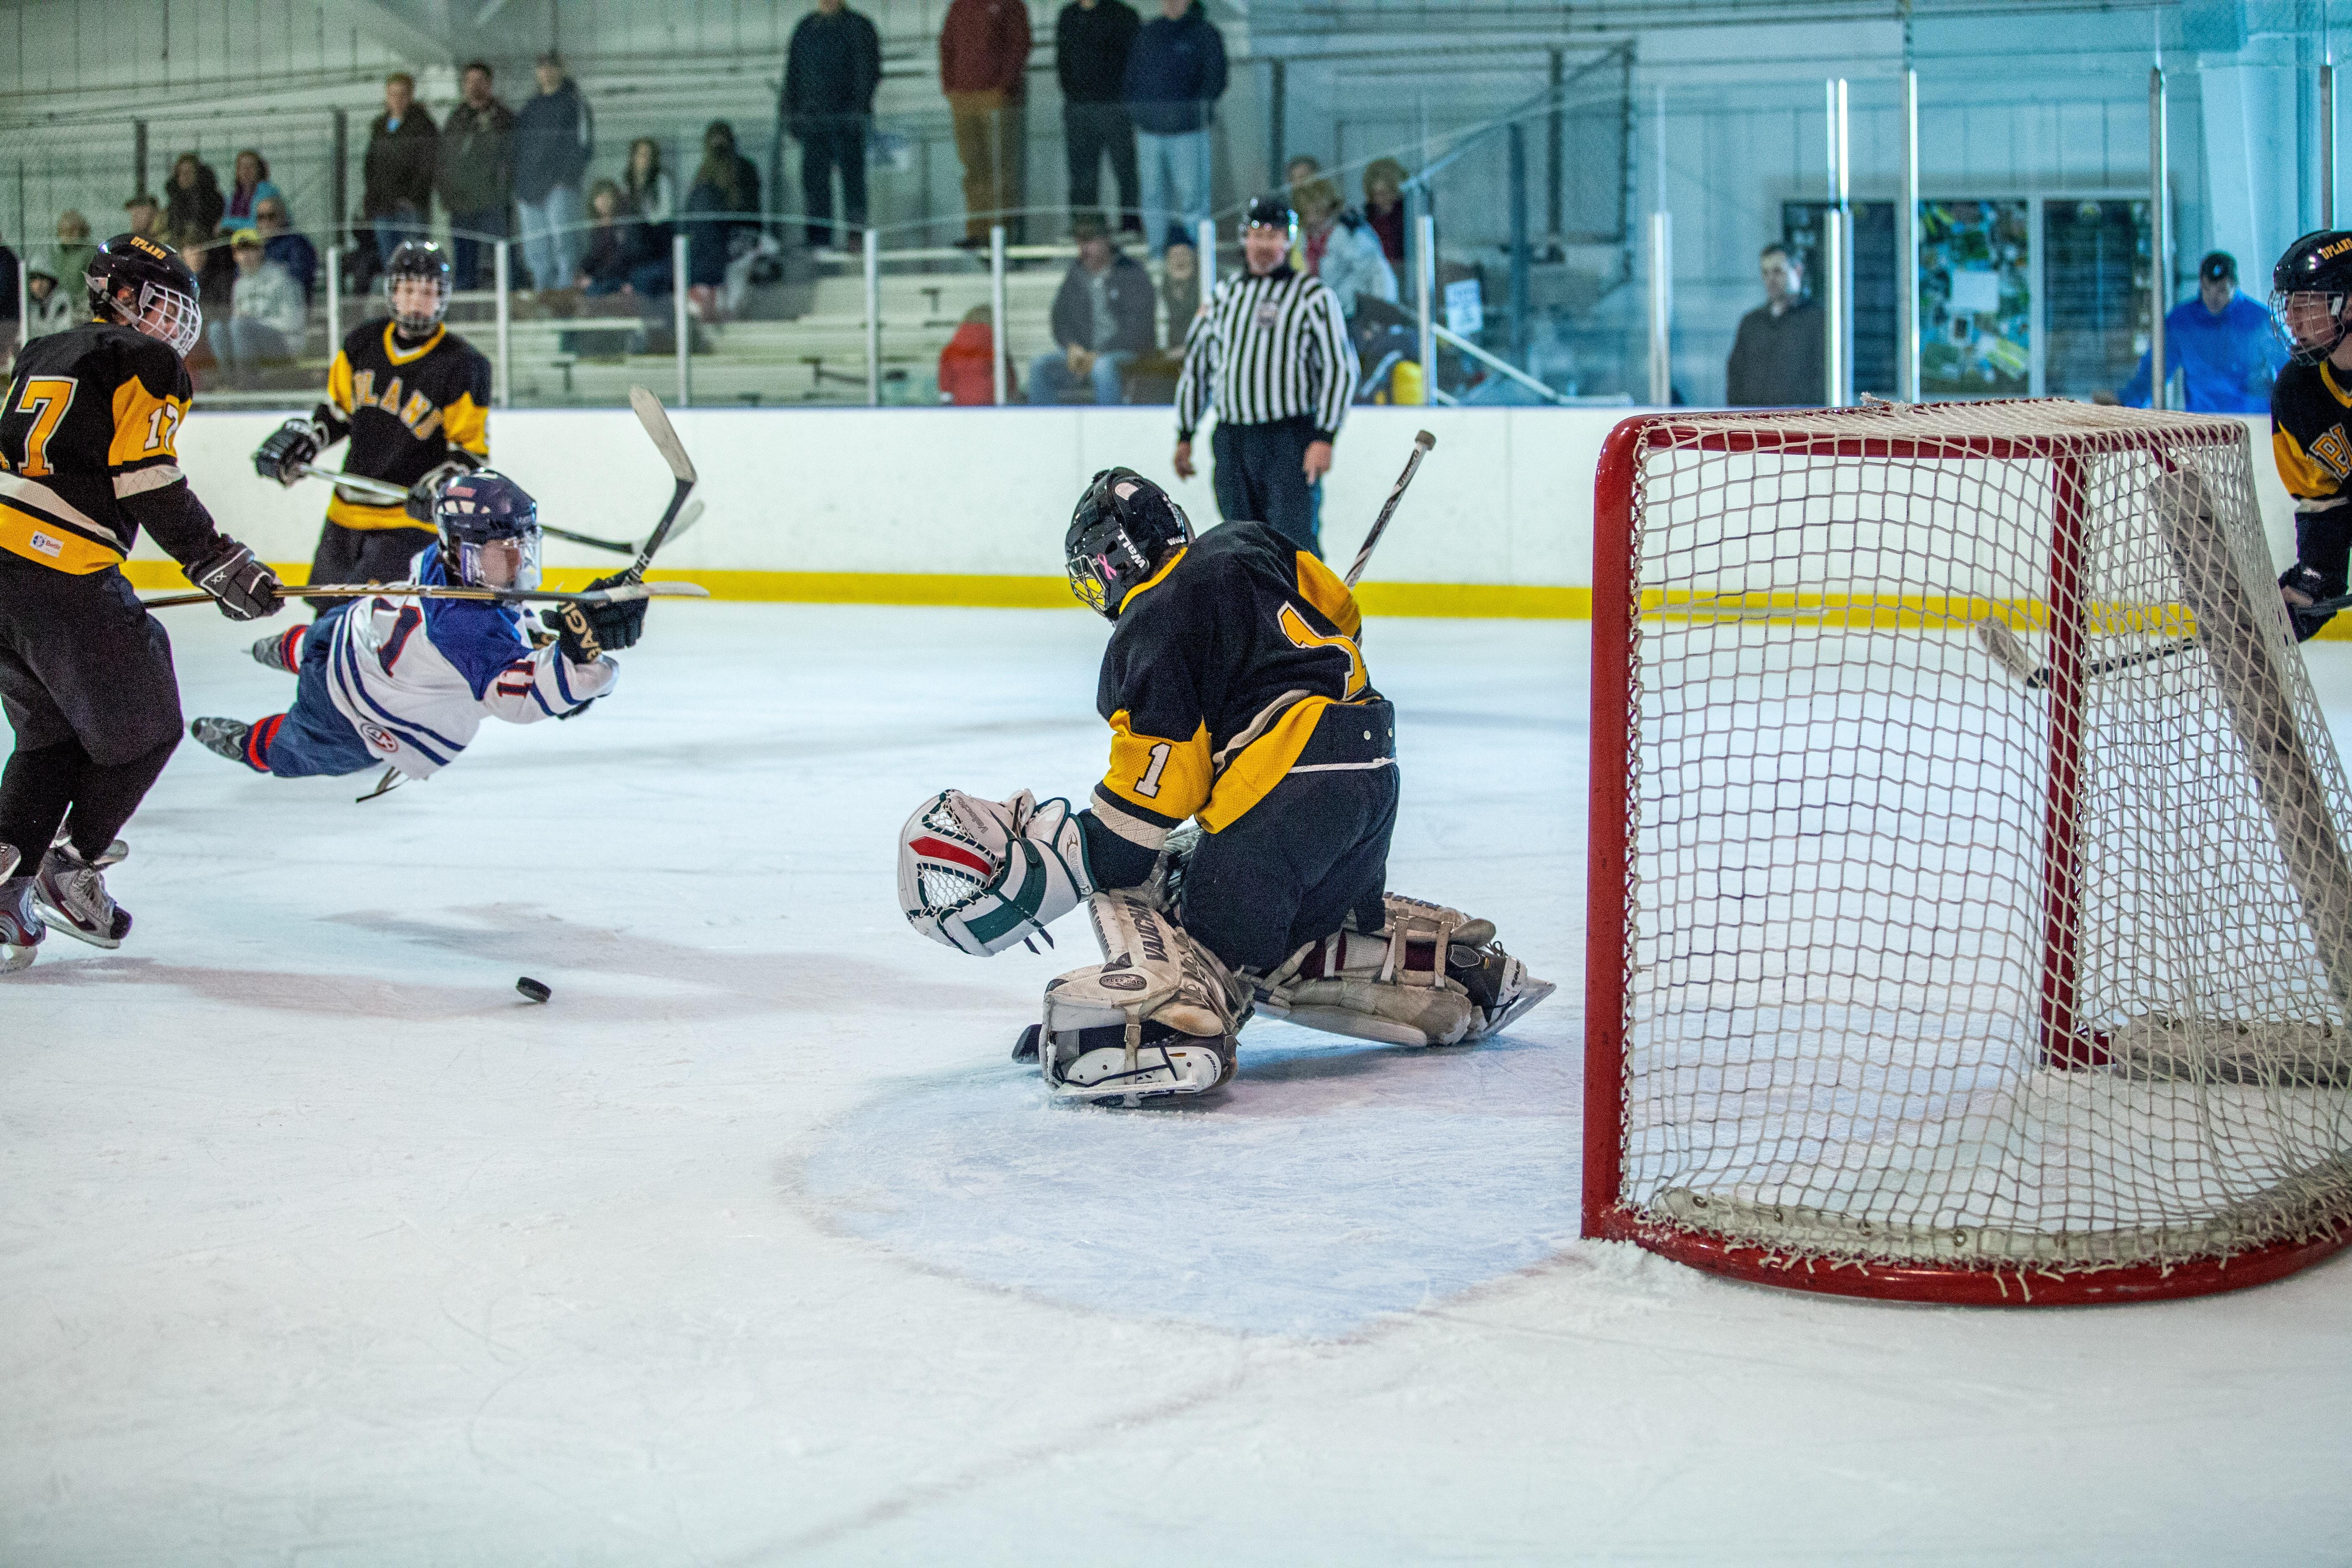 Open Hockey Goalie